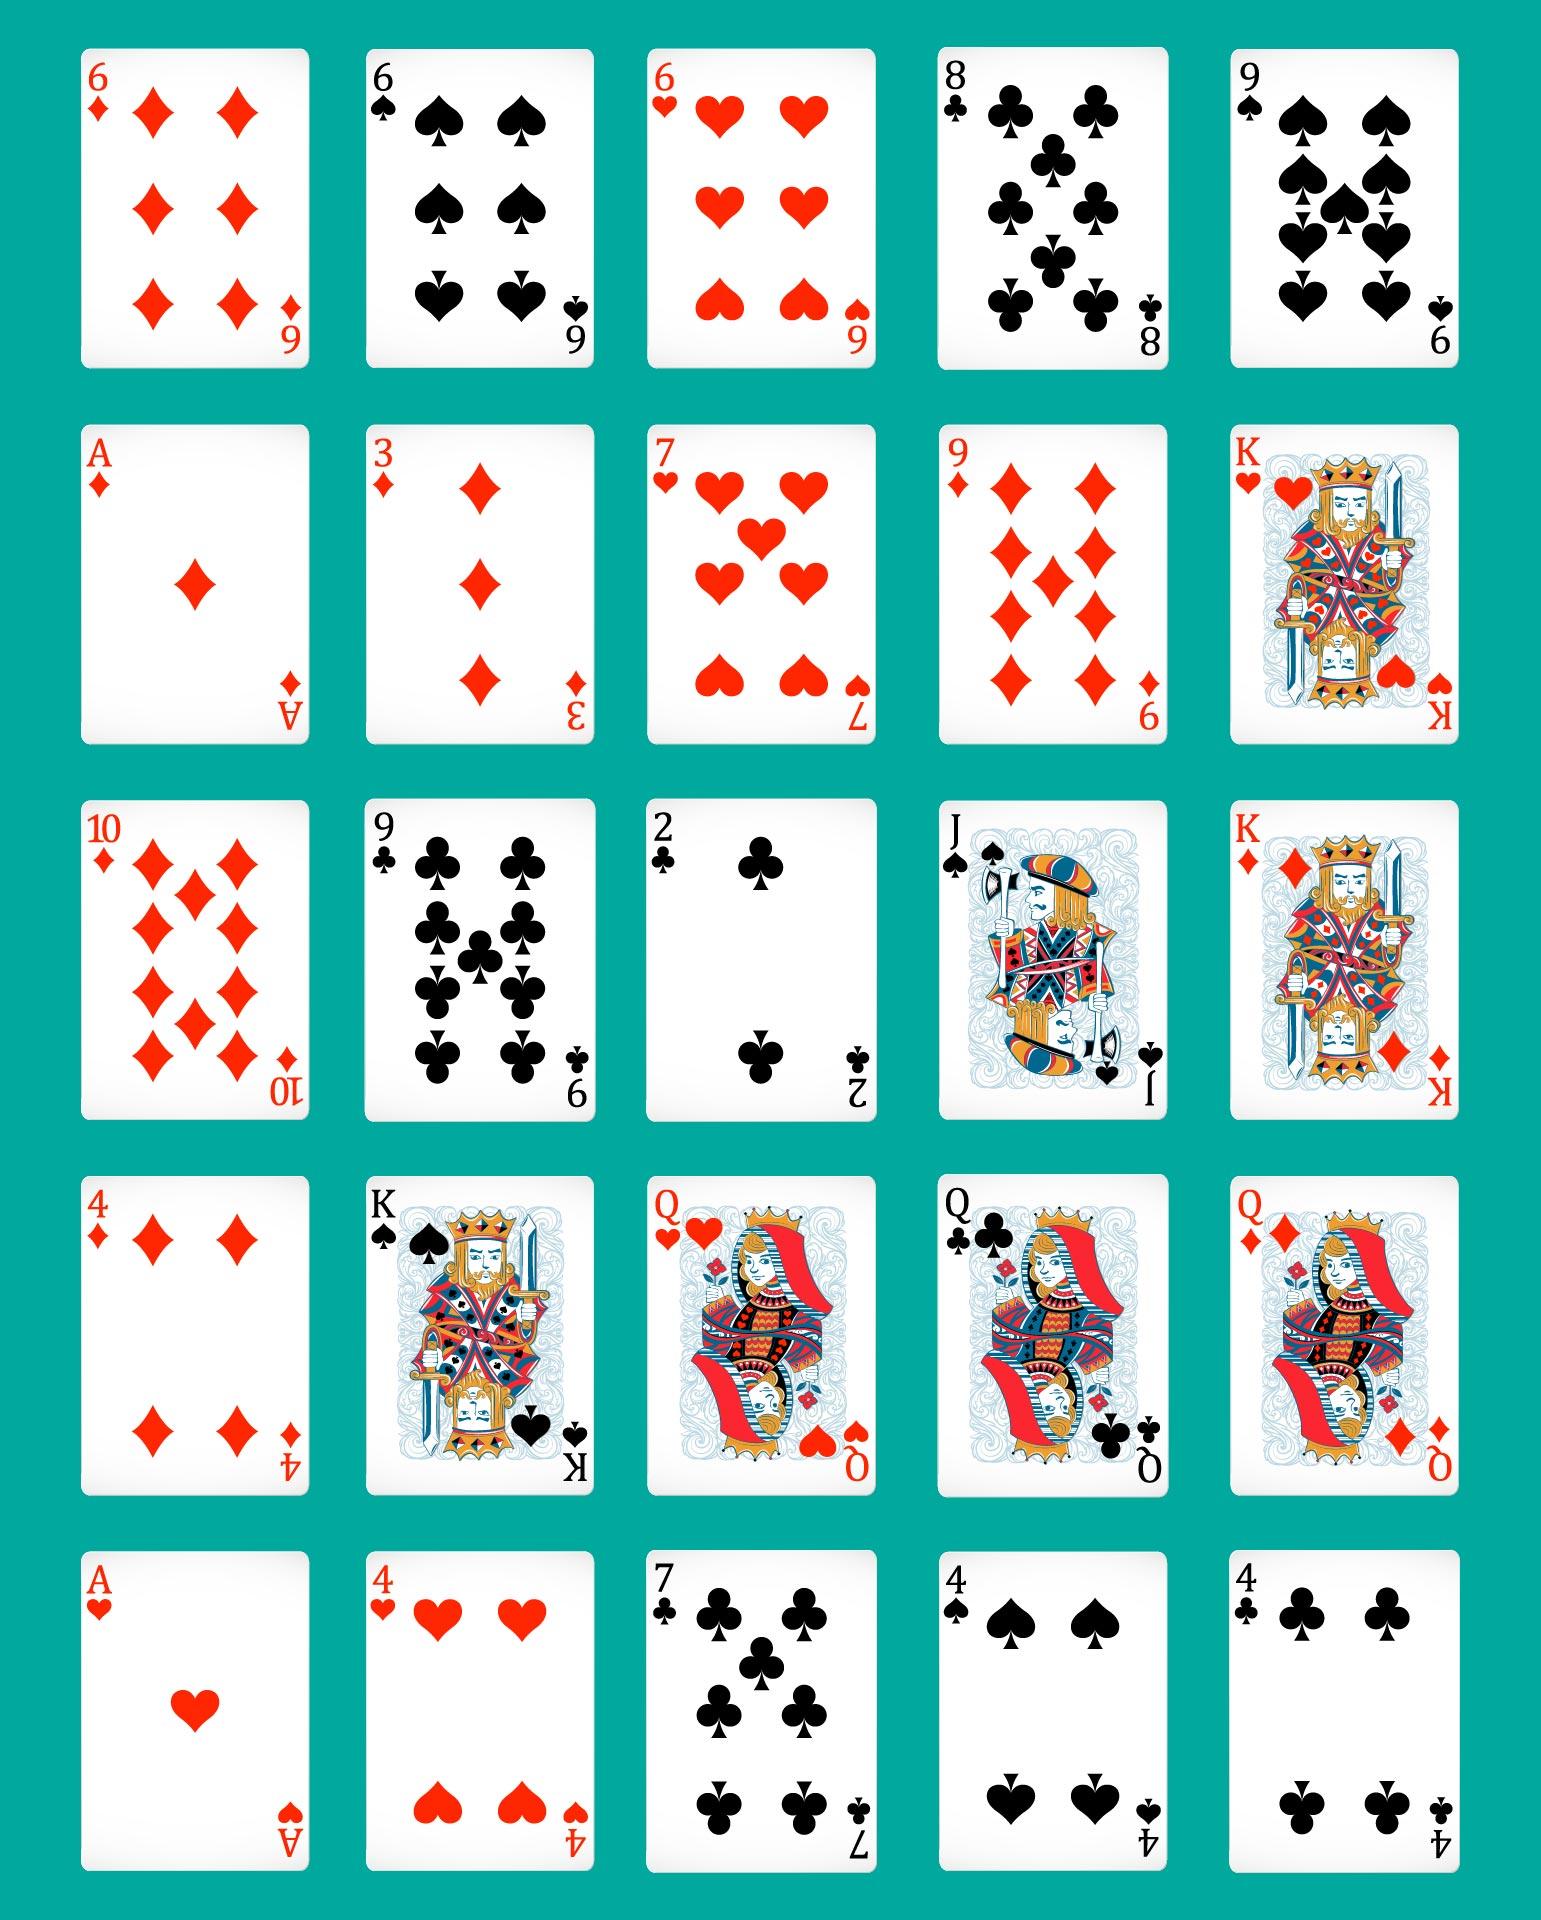 Printable Pokeno Board Game Instructions